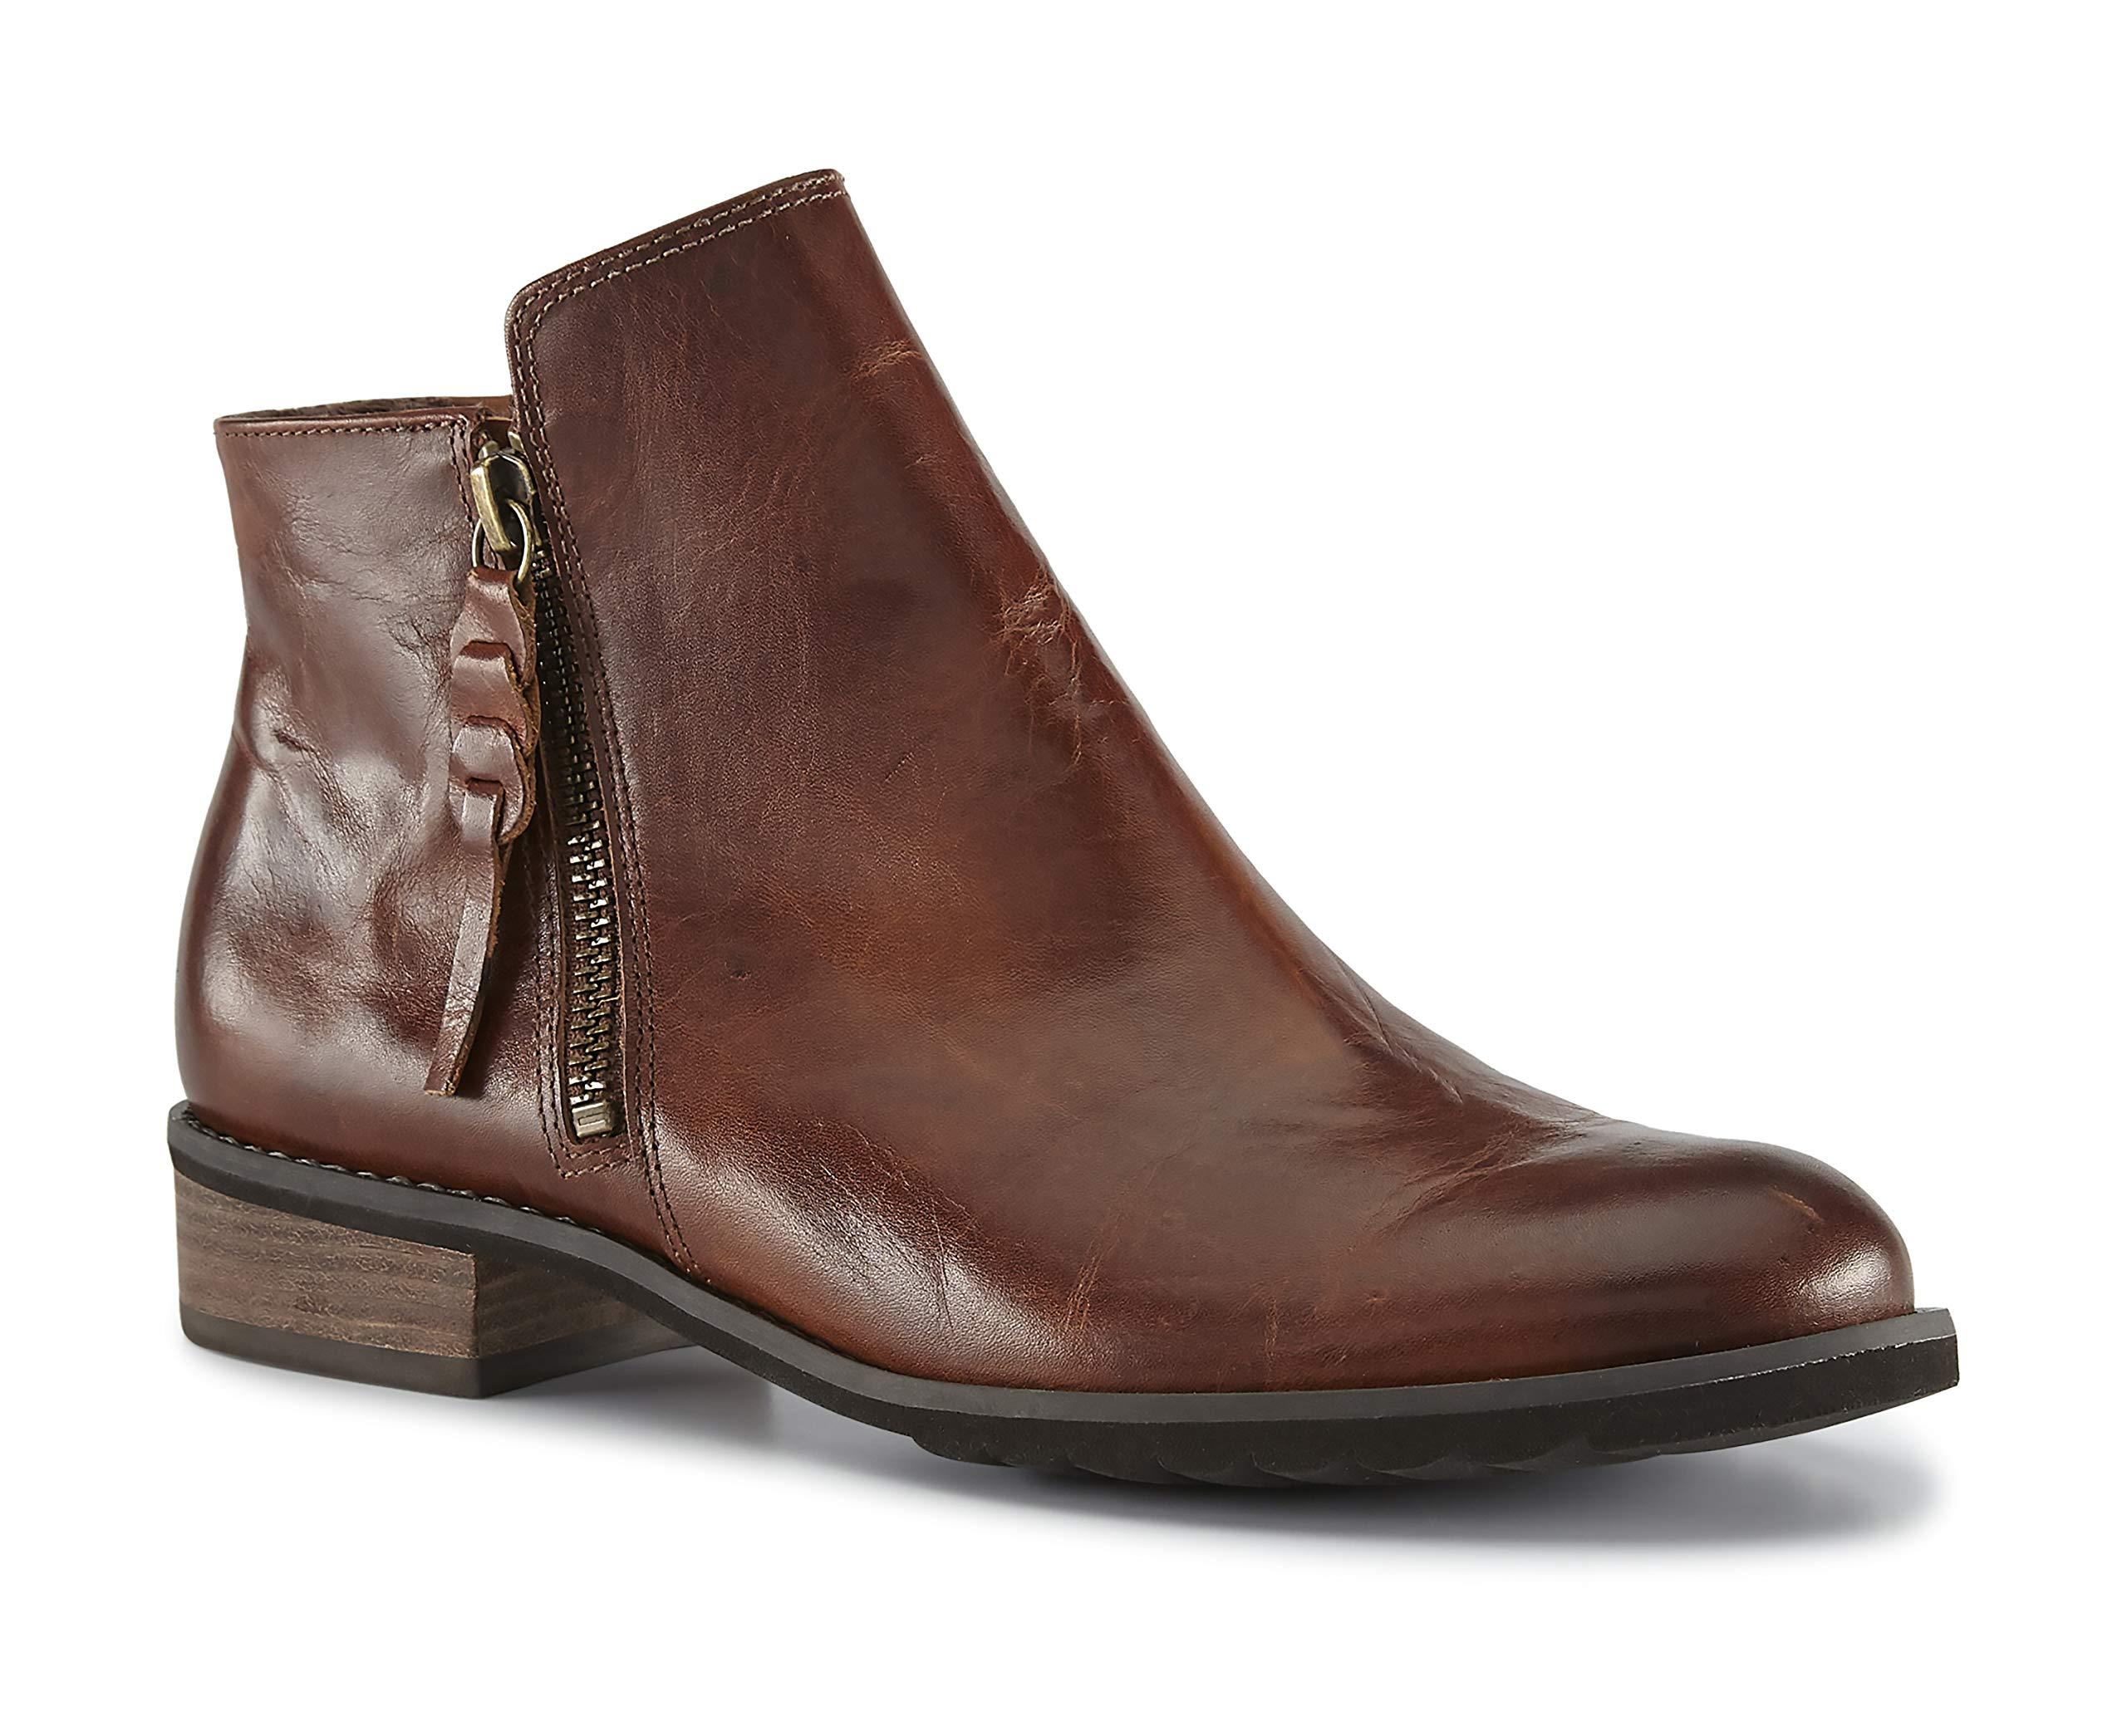 Walking Cradles Womens Chestnut Leather